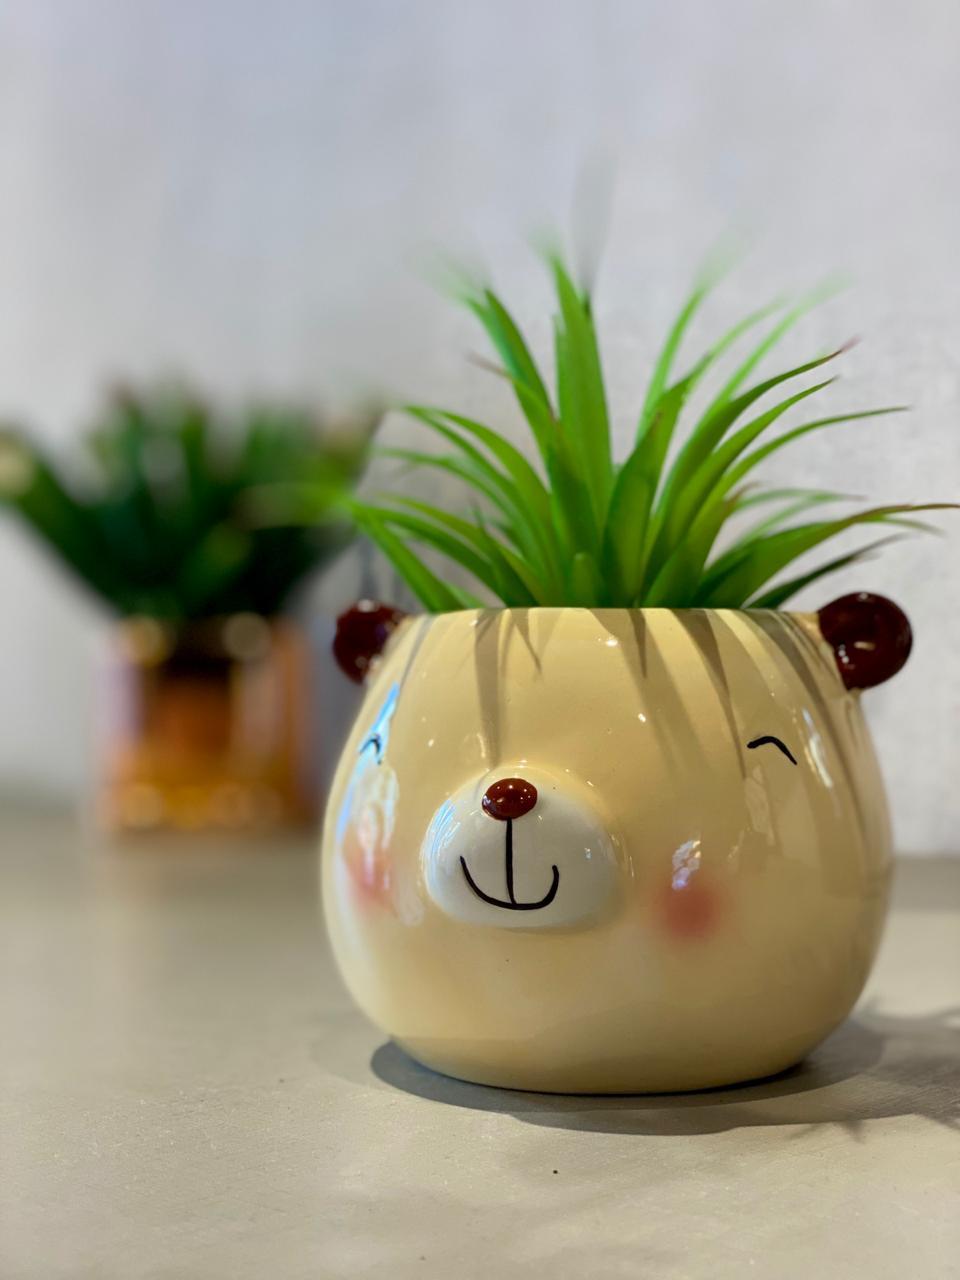 Vaso Decorativo Pets Colection: Urso - La Fleur